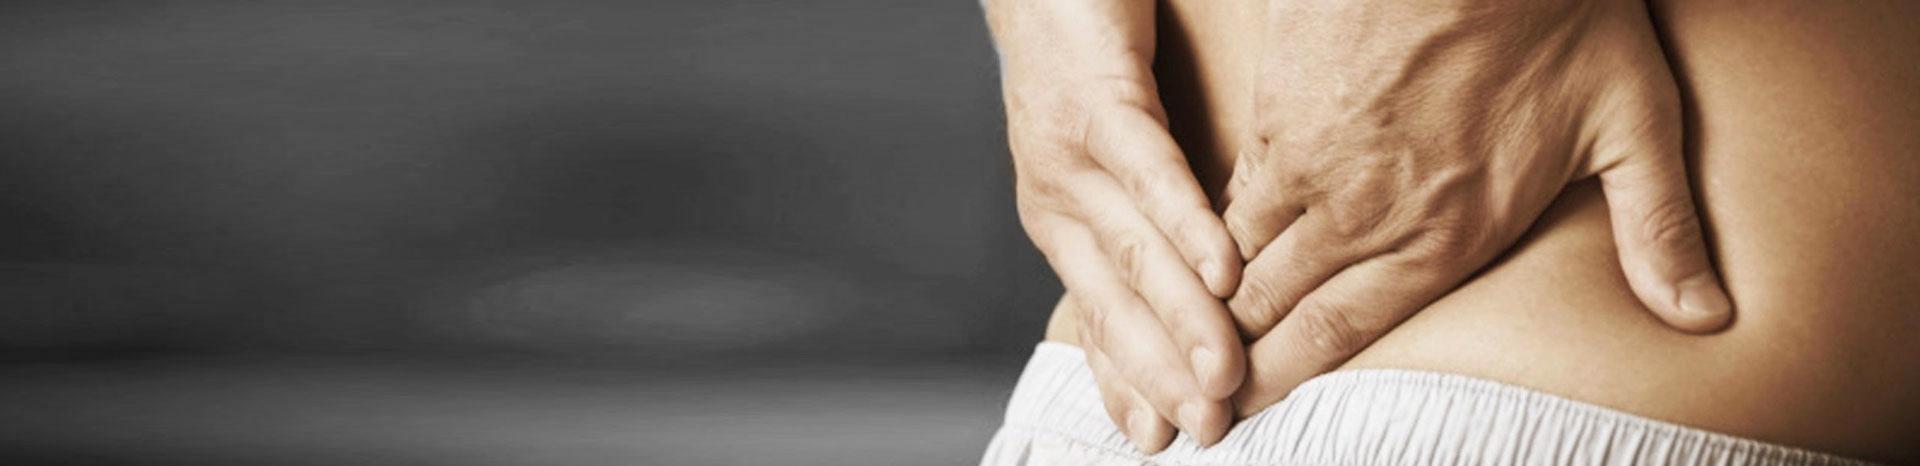 Rugpijn na auto ongeluk